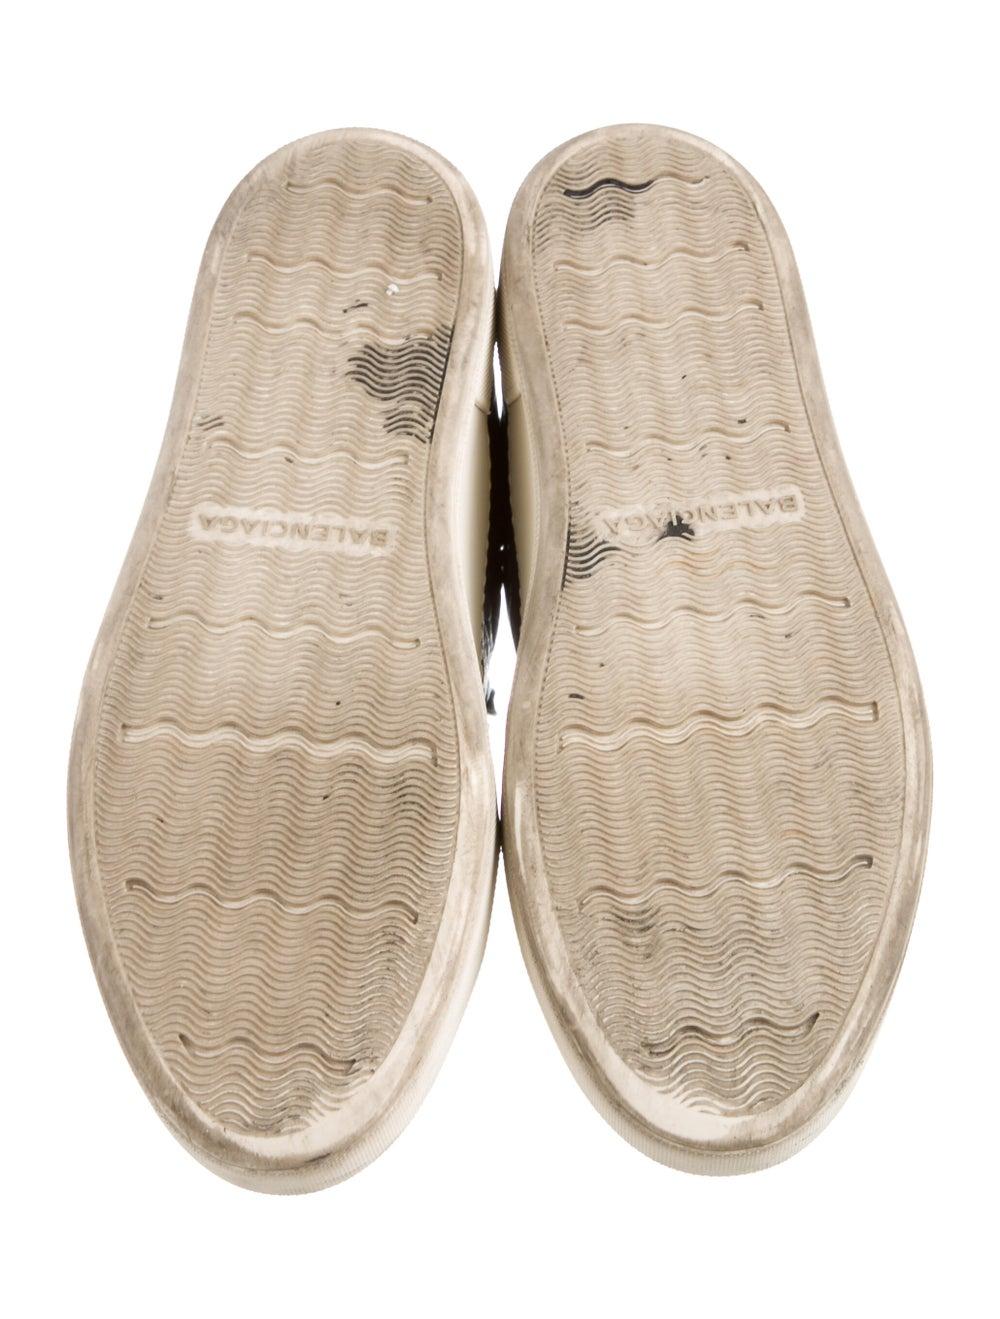 Balenciaga Cap-Toe Low-Top Sneakers Gris - image 5